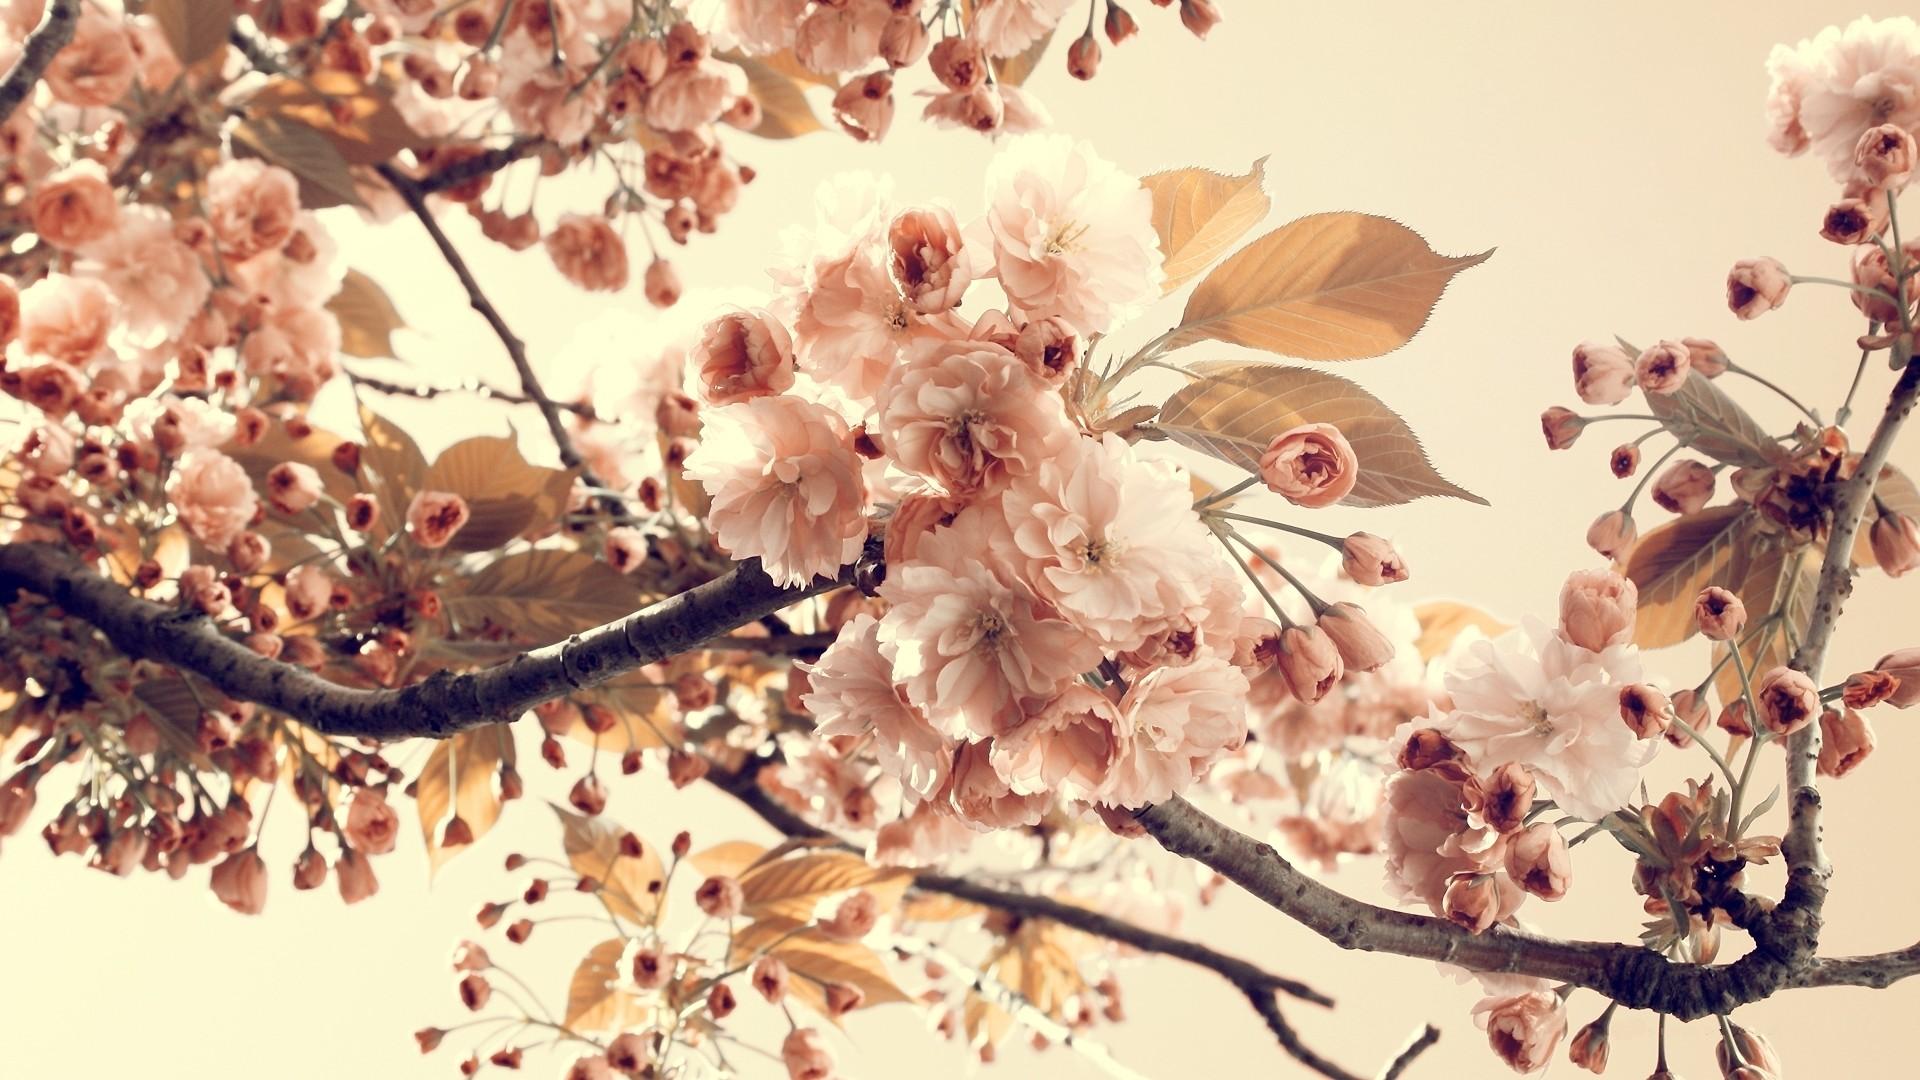 46 Floral Vintage Wallpaper On Wallpapersafari